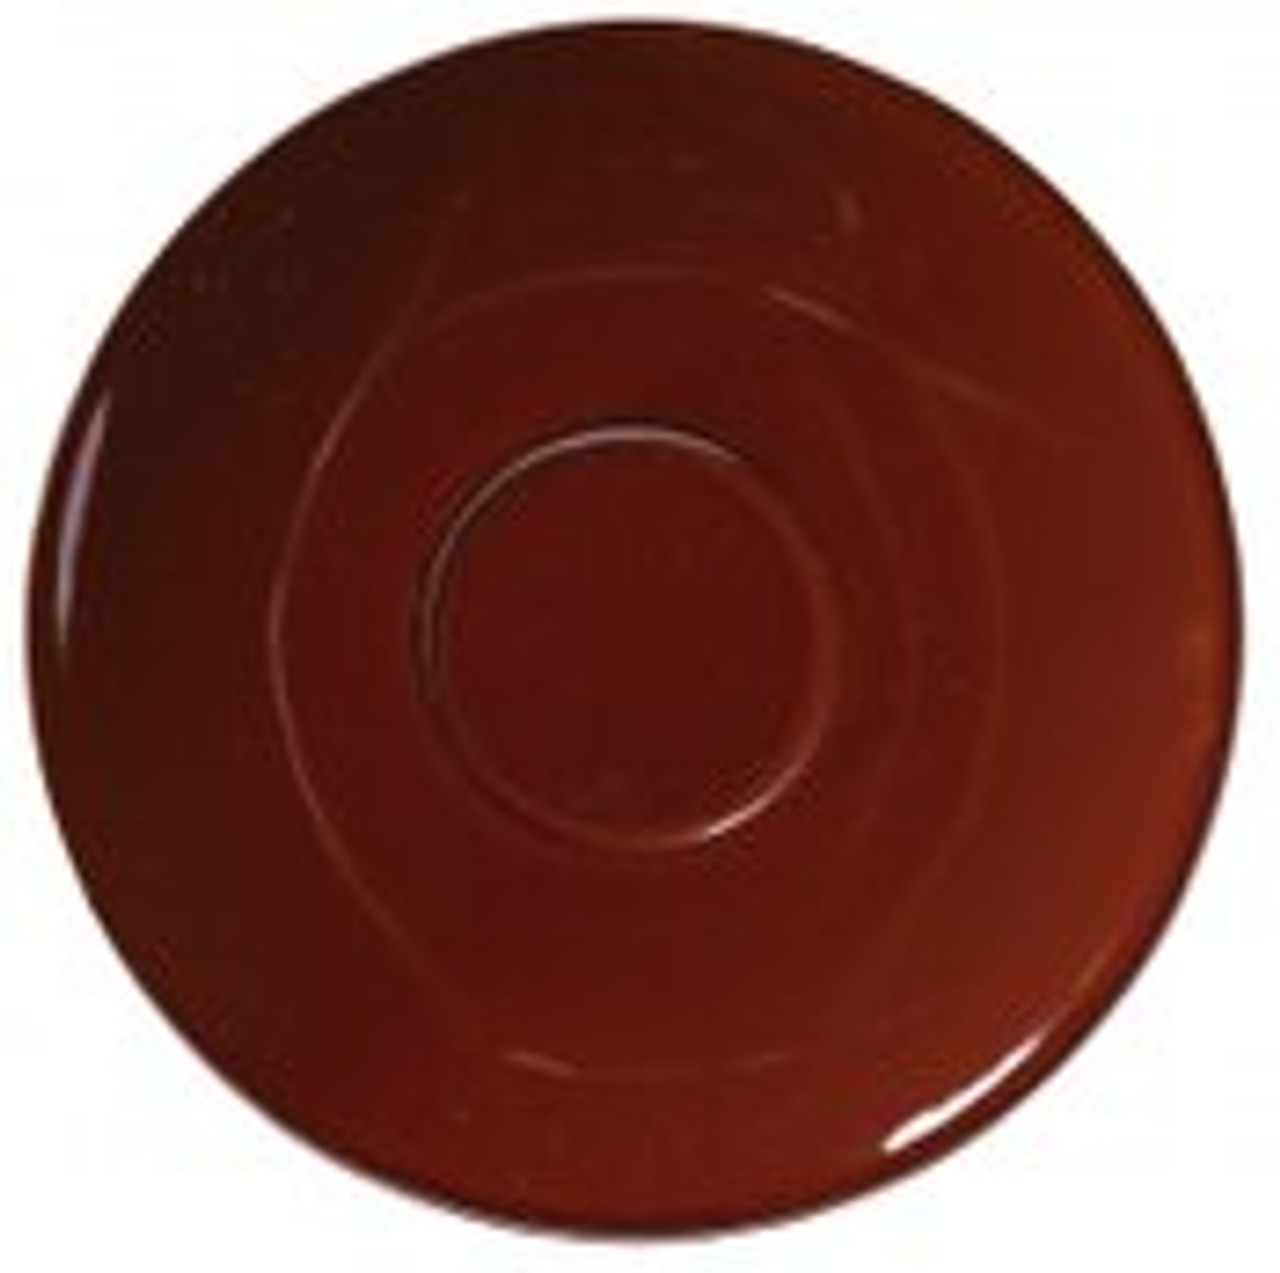 "Revolution Revware Saucer, 4.5"", brown"